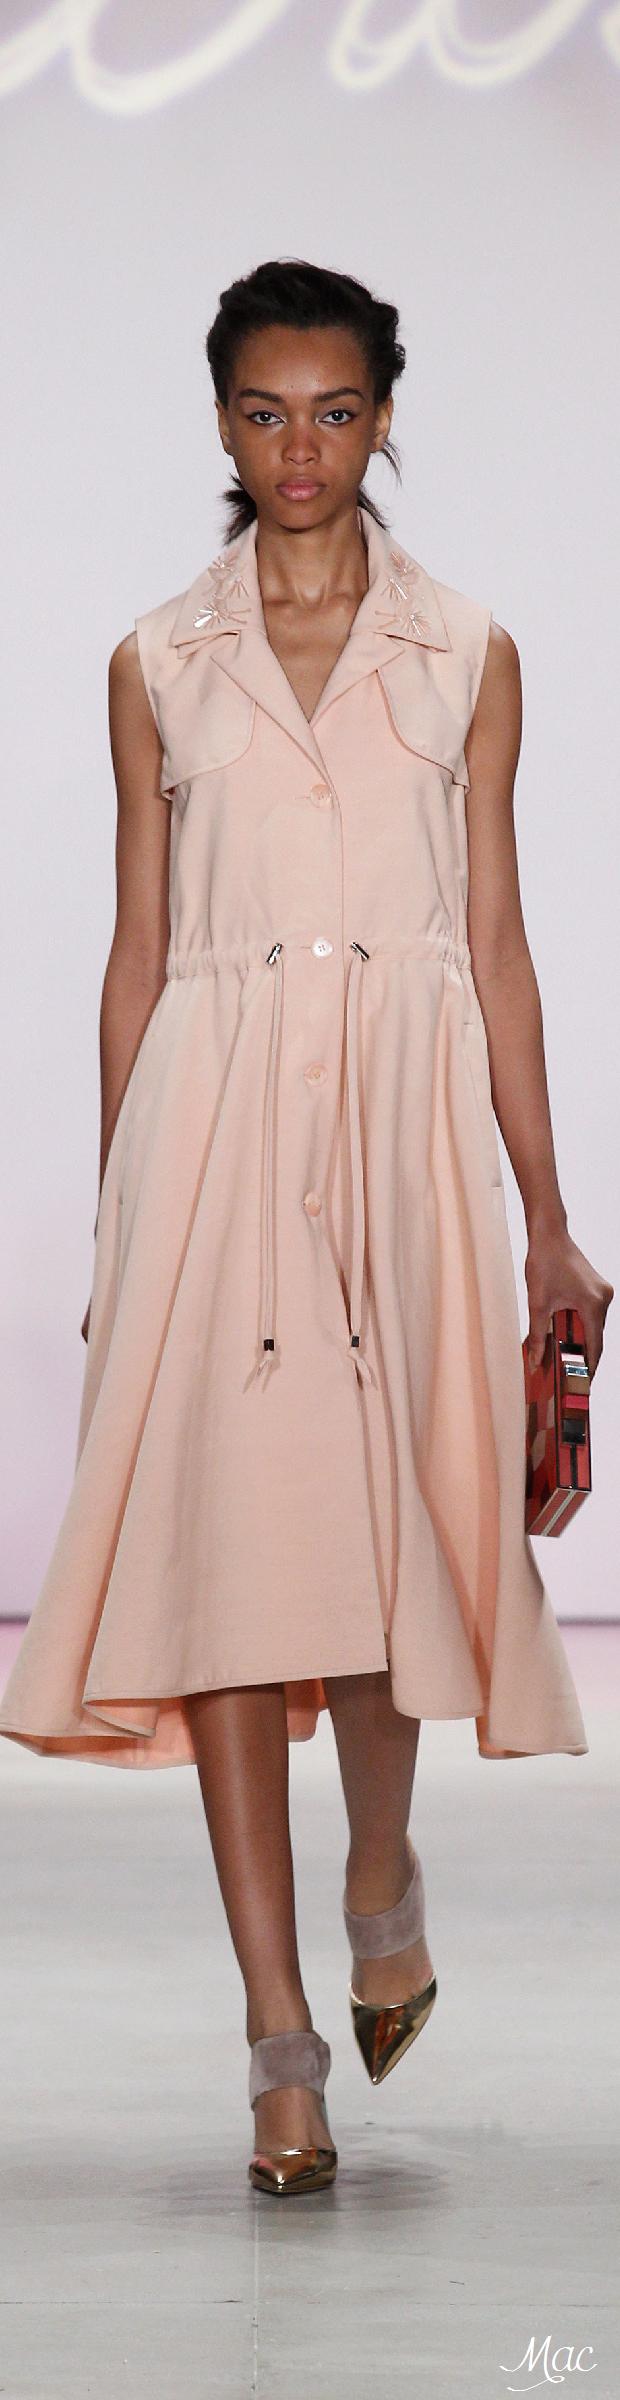 Spring 2016 Ready-to-Wear Lela Rose | LELA ROSE | Pinterest ...